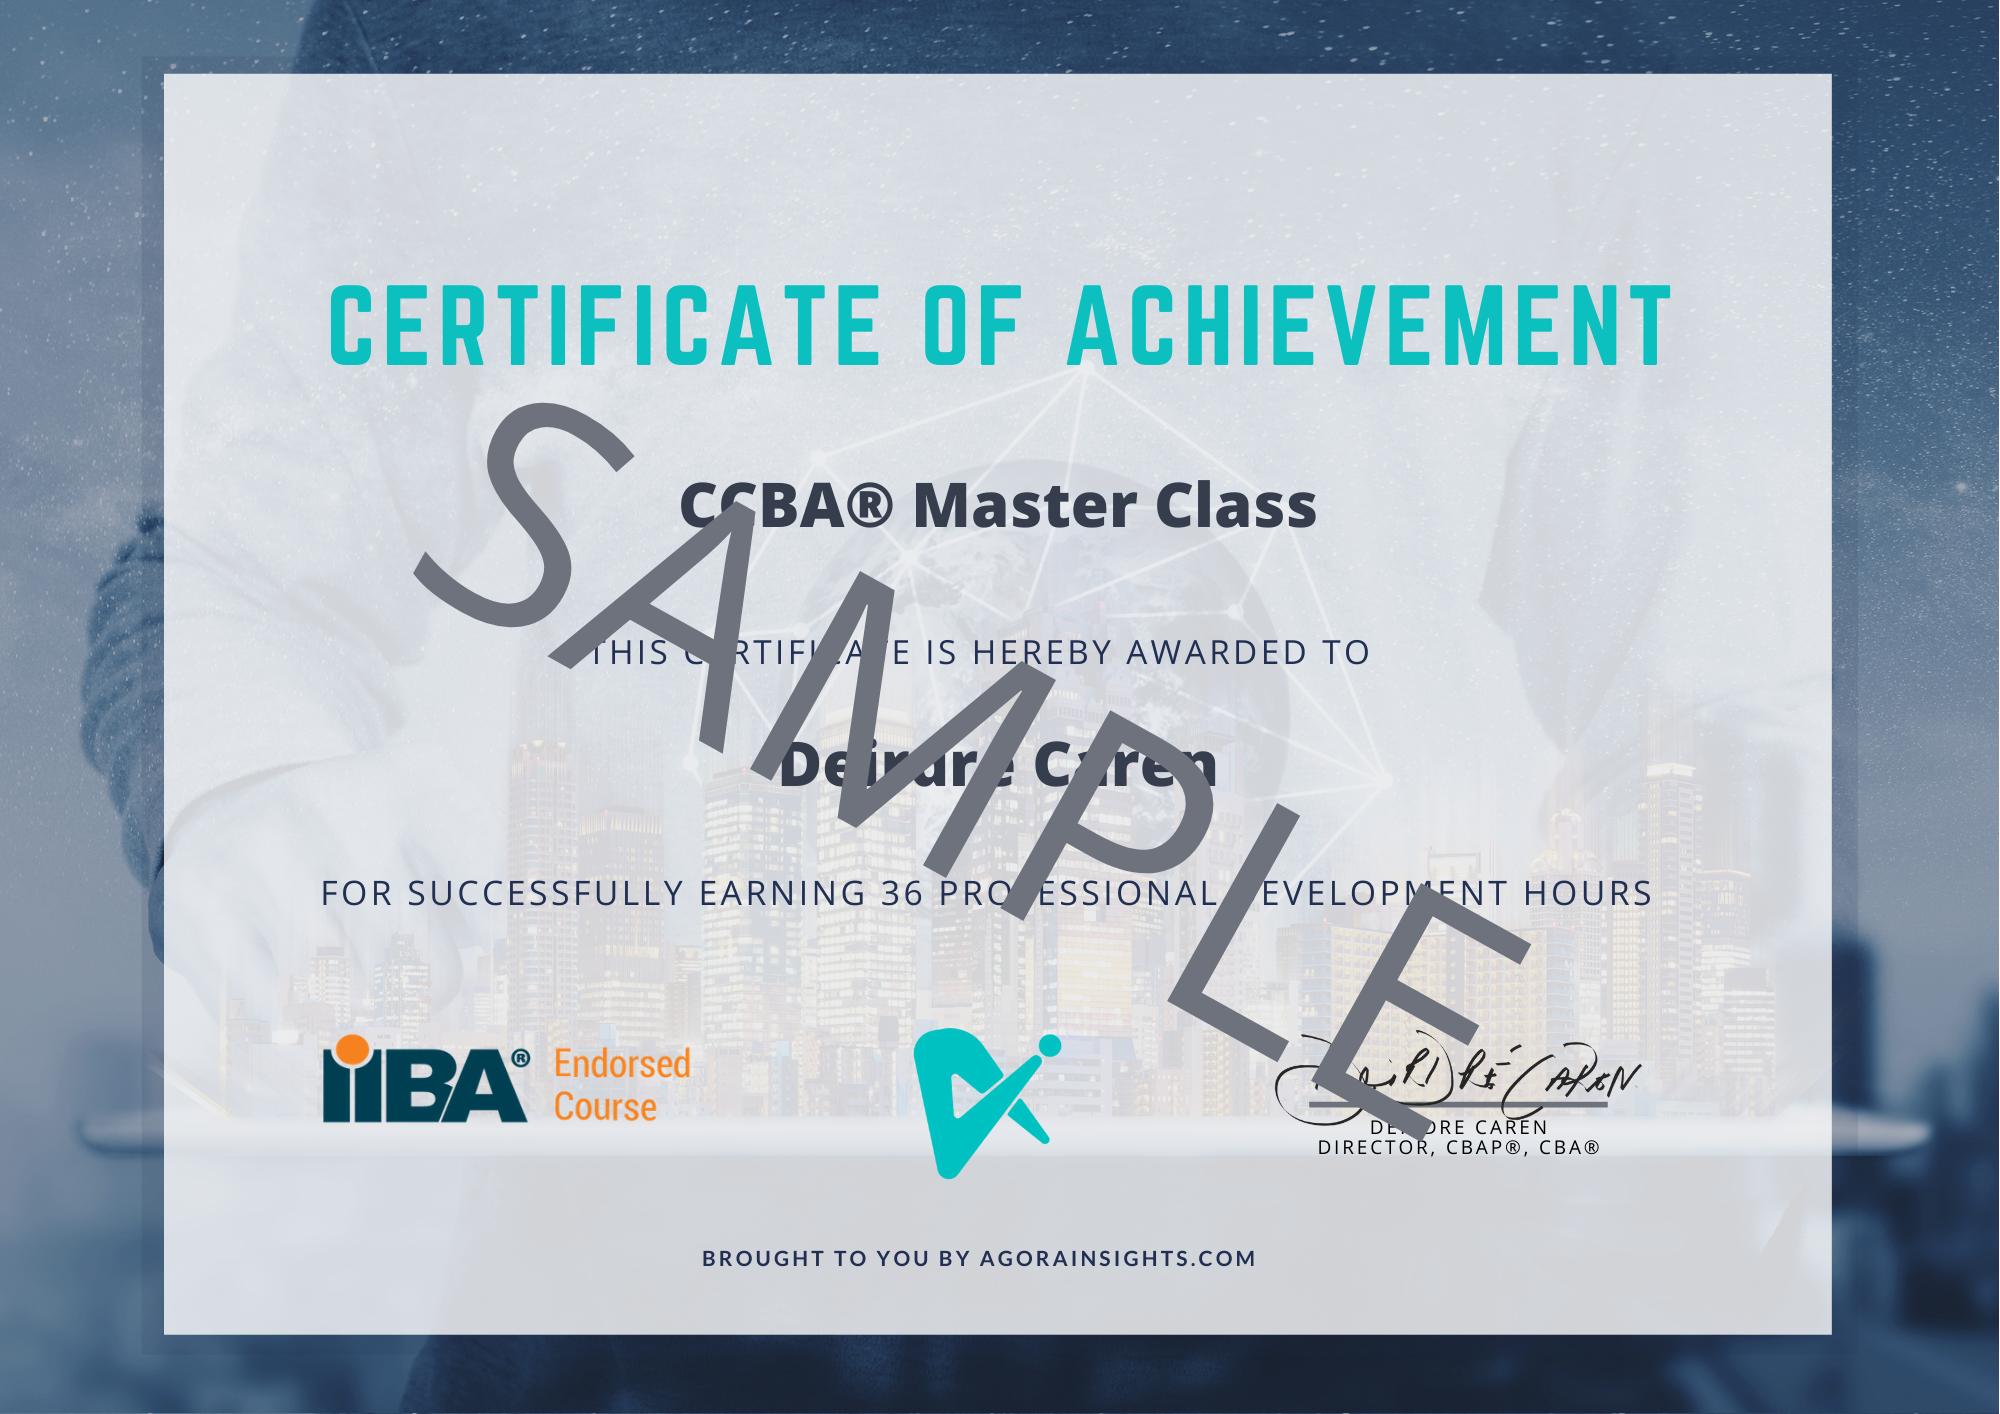 CCBA Master Class Certificate Sample